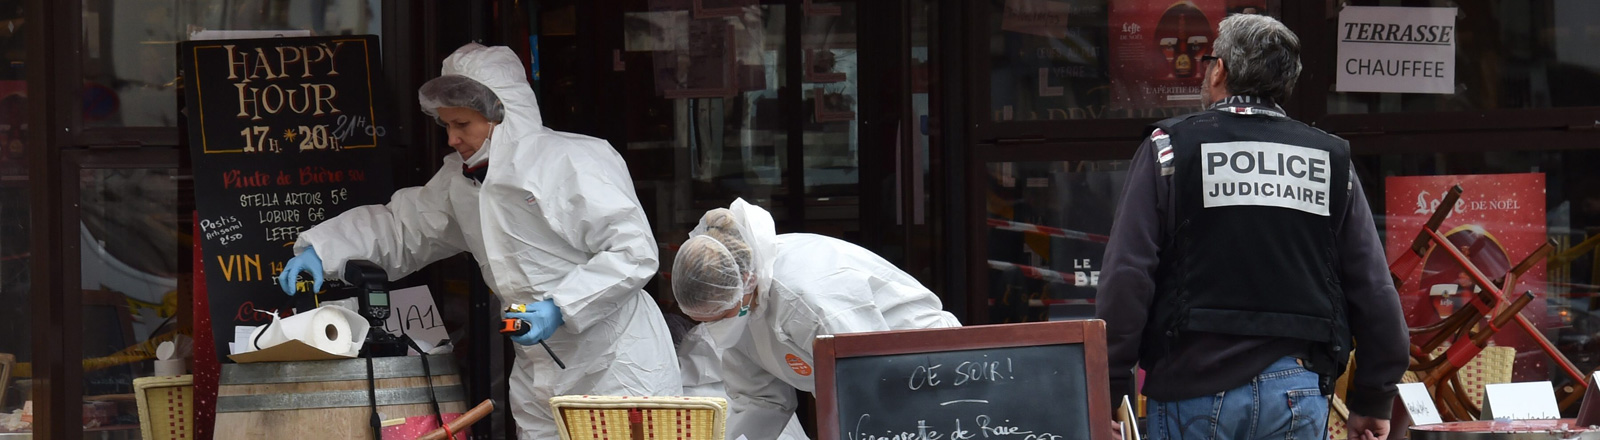 Spurensicherung vor dem Comptoir Voltaire in Paris.